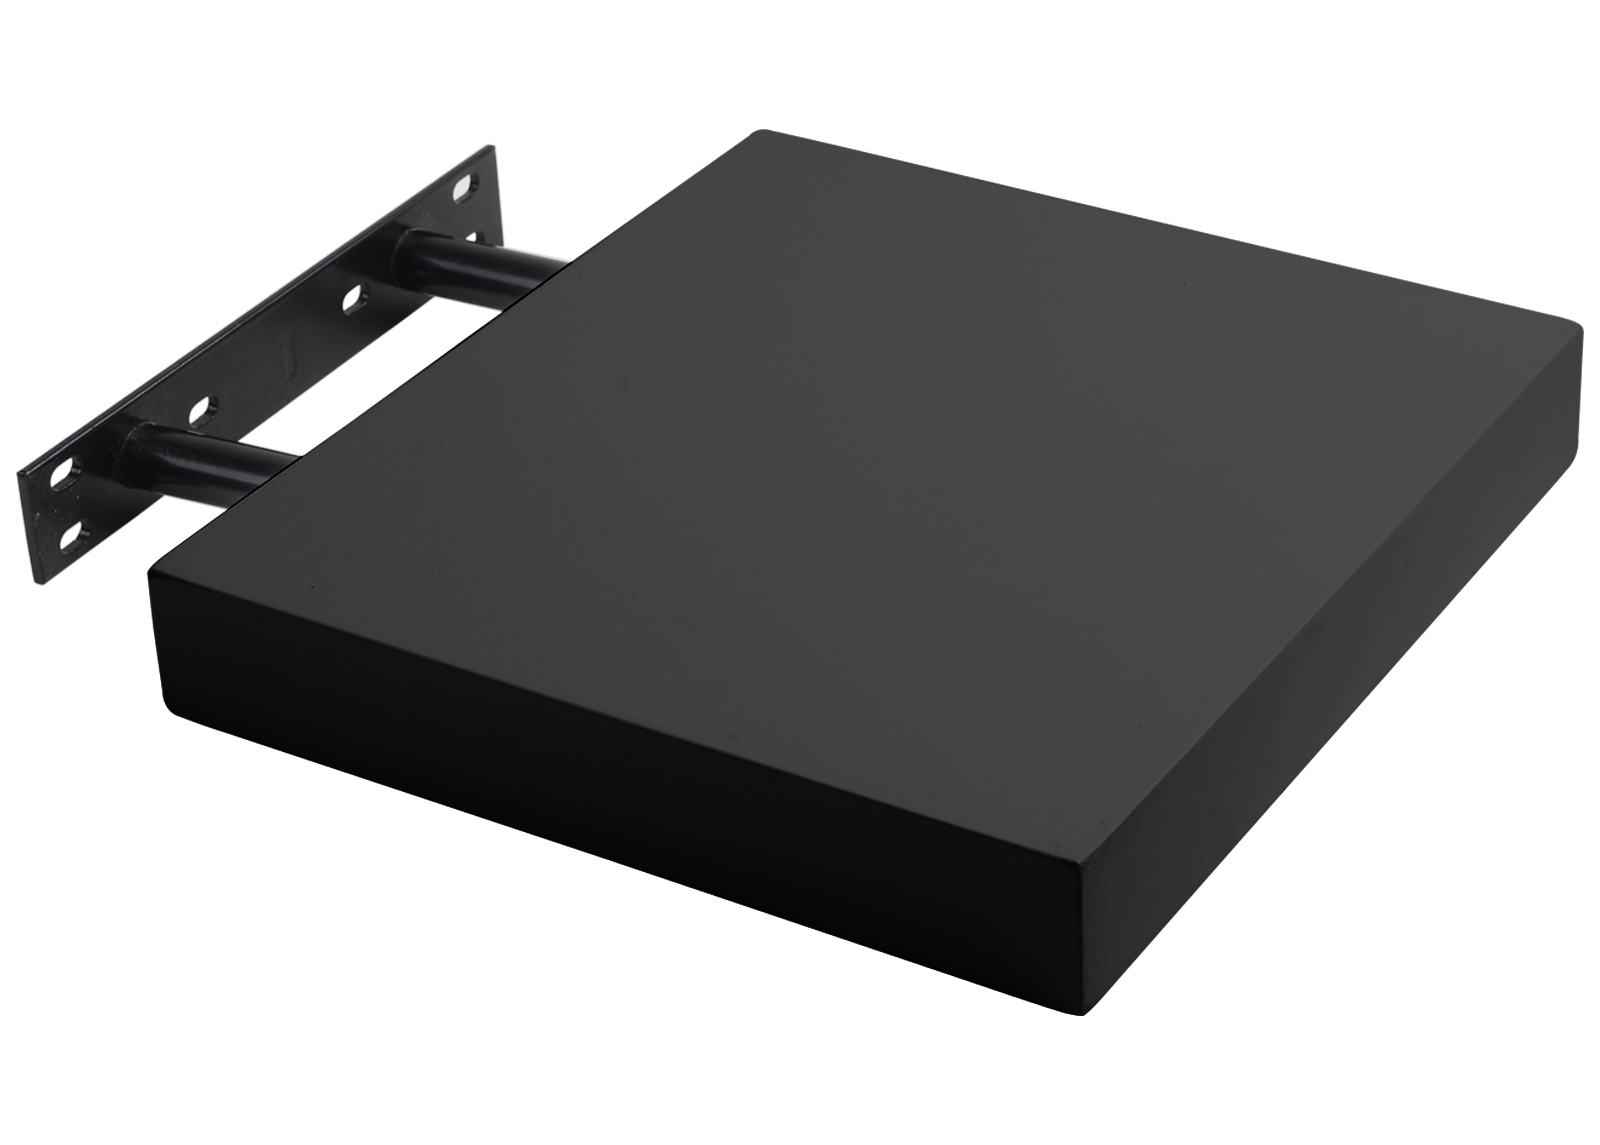 woltu wandregal wandboard buchregal h ngeregal dvd regal. Black Bedroom Furniture Sets. Home Design Ideas